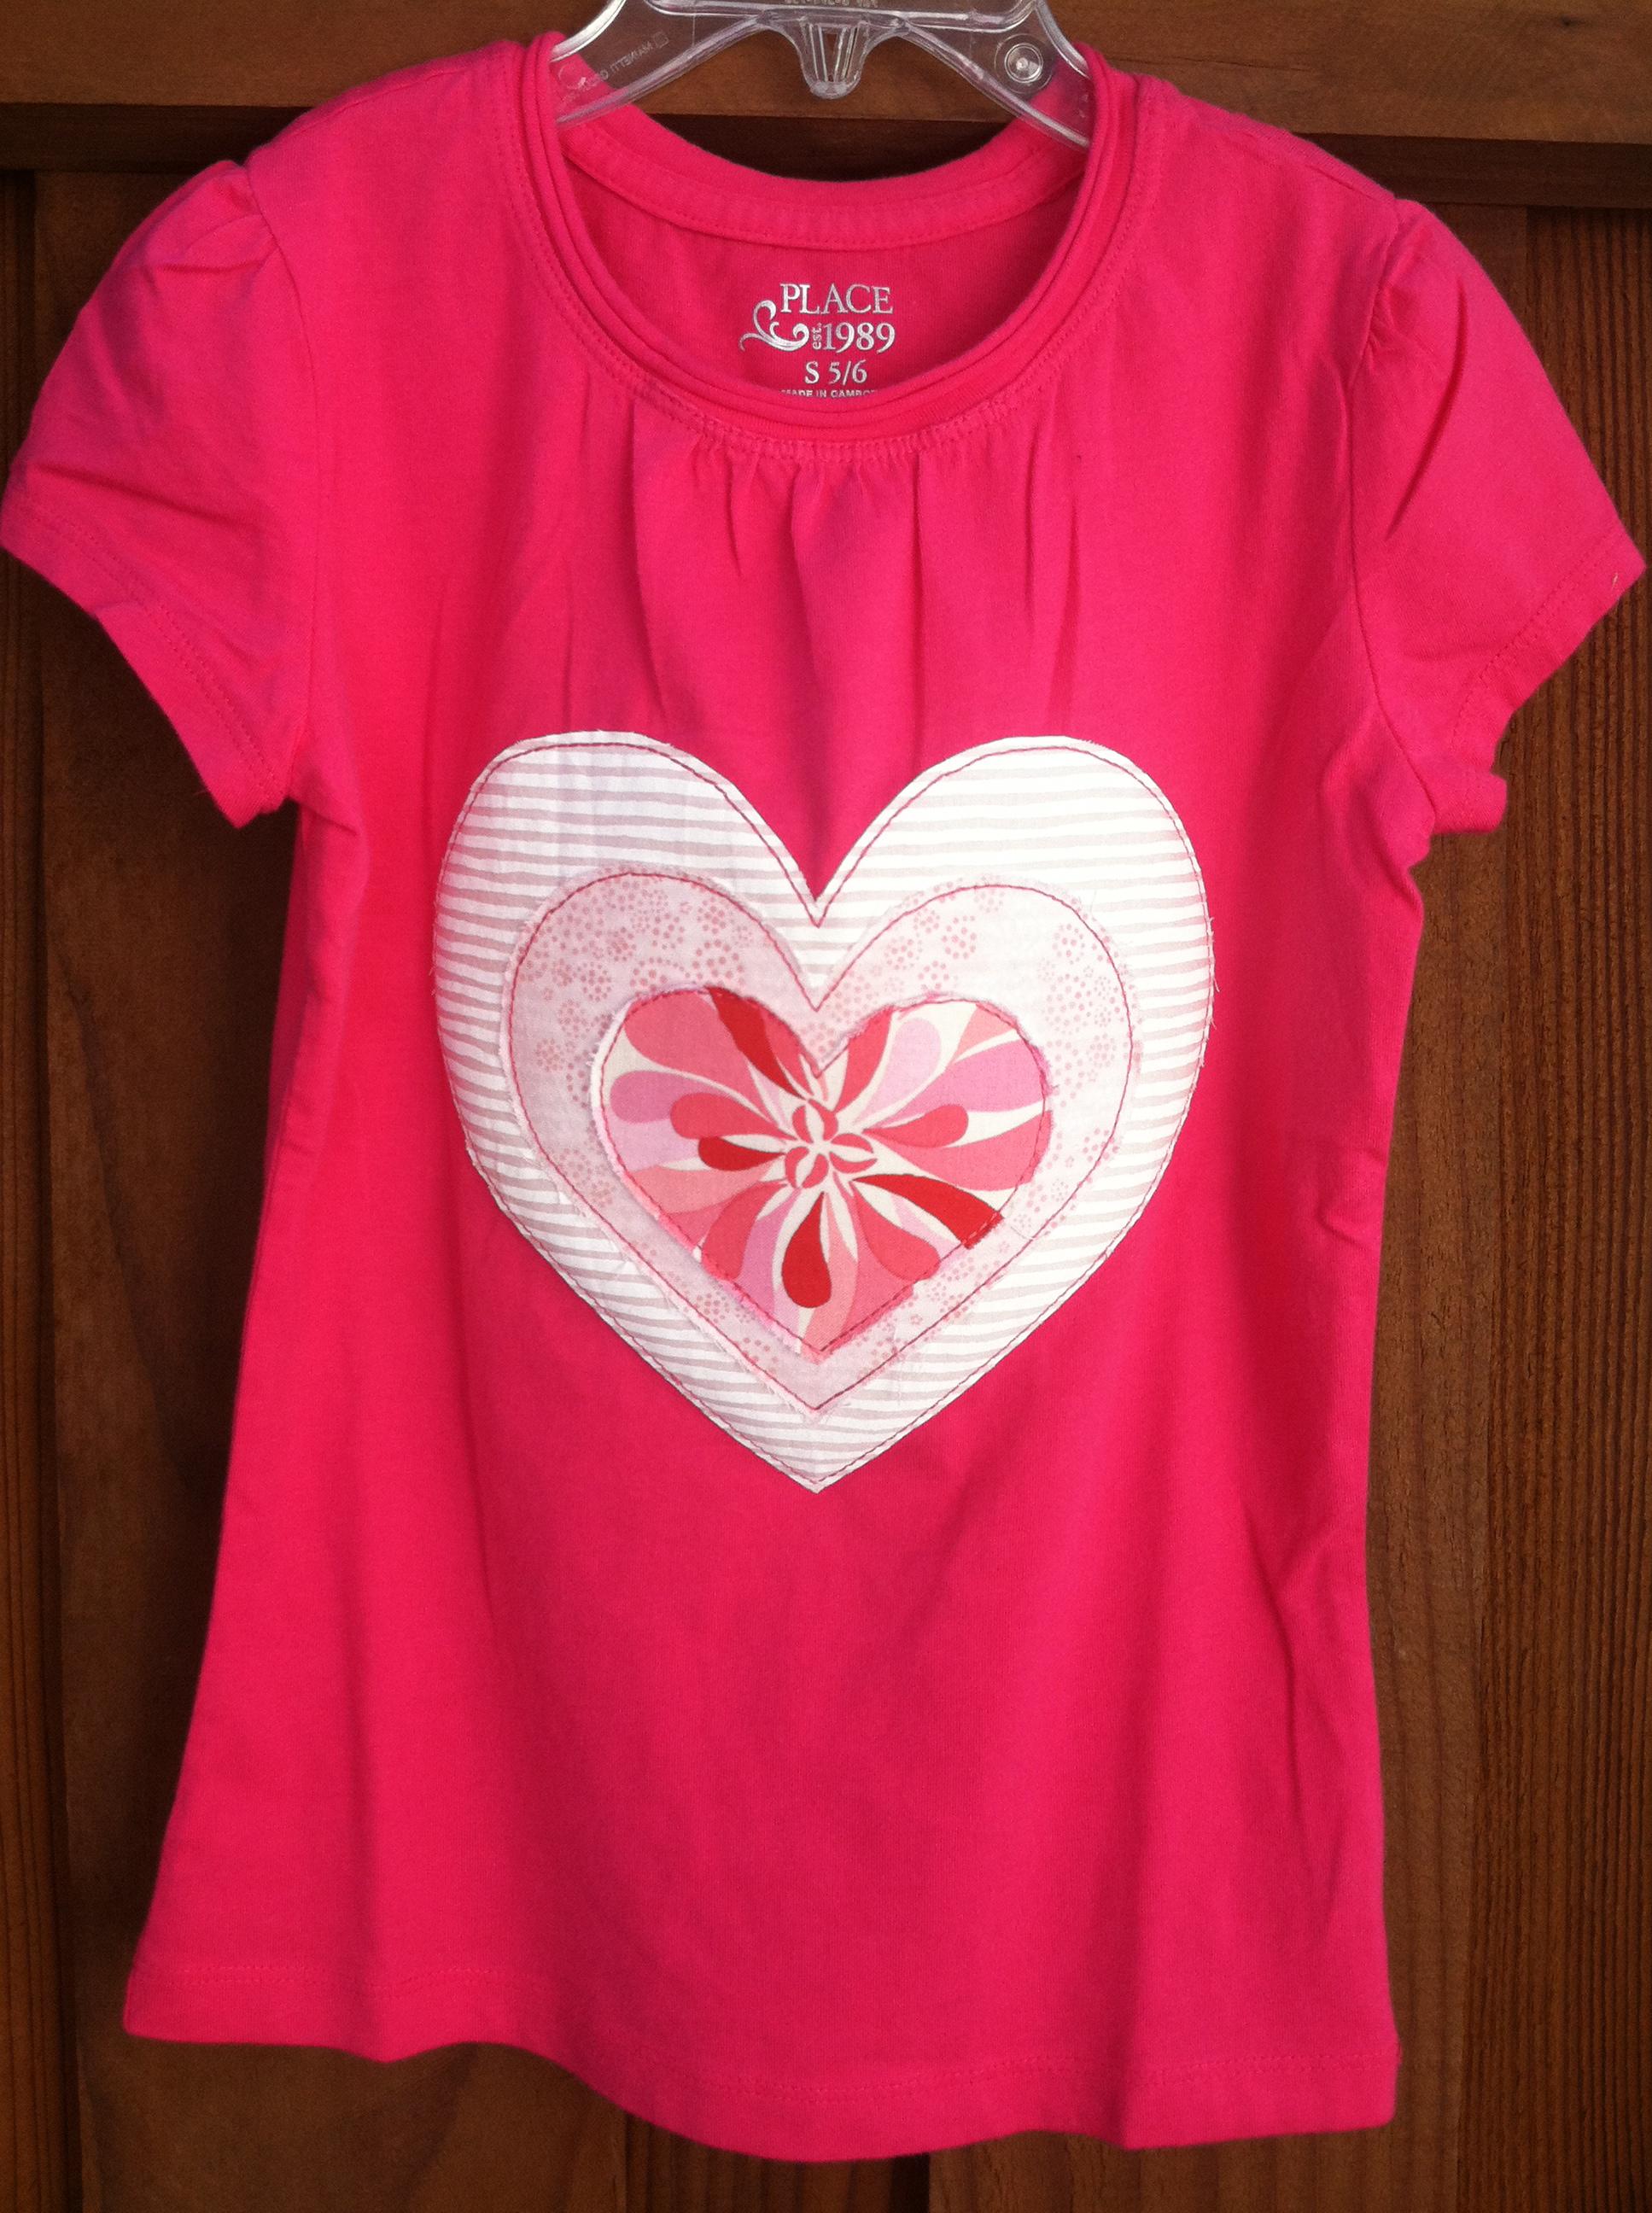 5 Year Old Shirts Birthday Birthdayshirt Girl Shirt Front